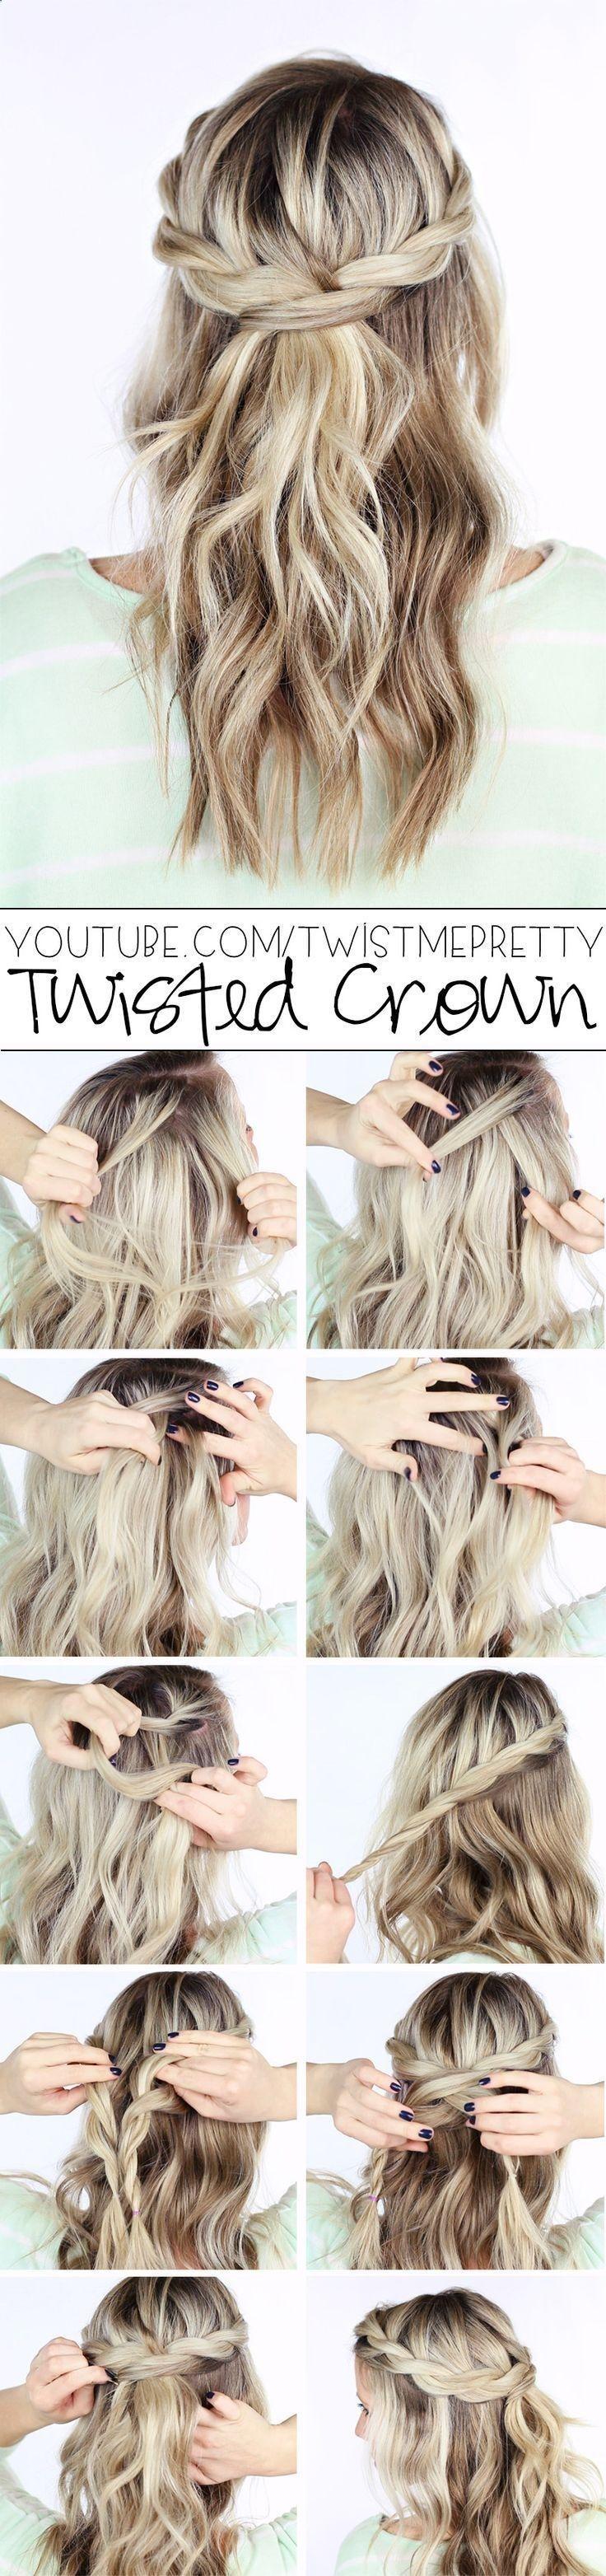 DIY Wedding Hairstyle - Twisted crown braid half up half down ...